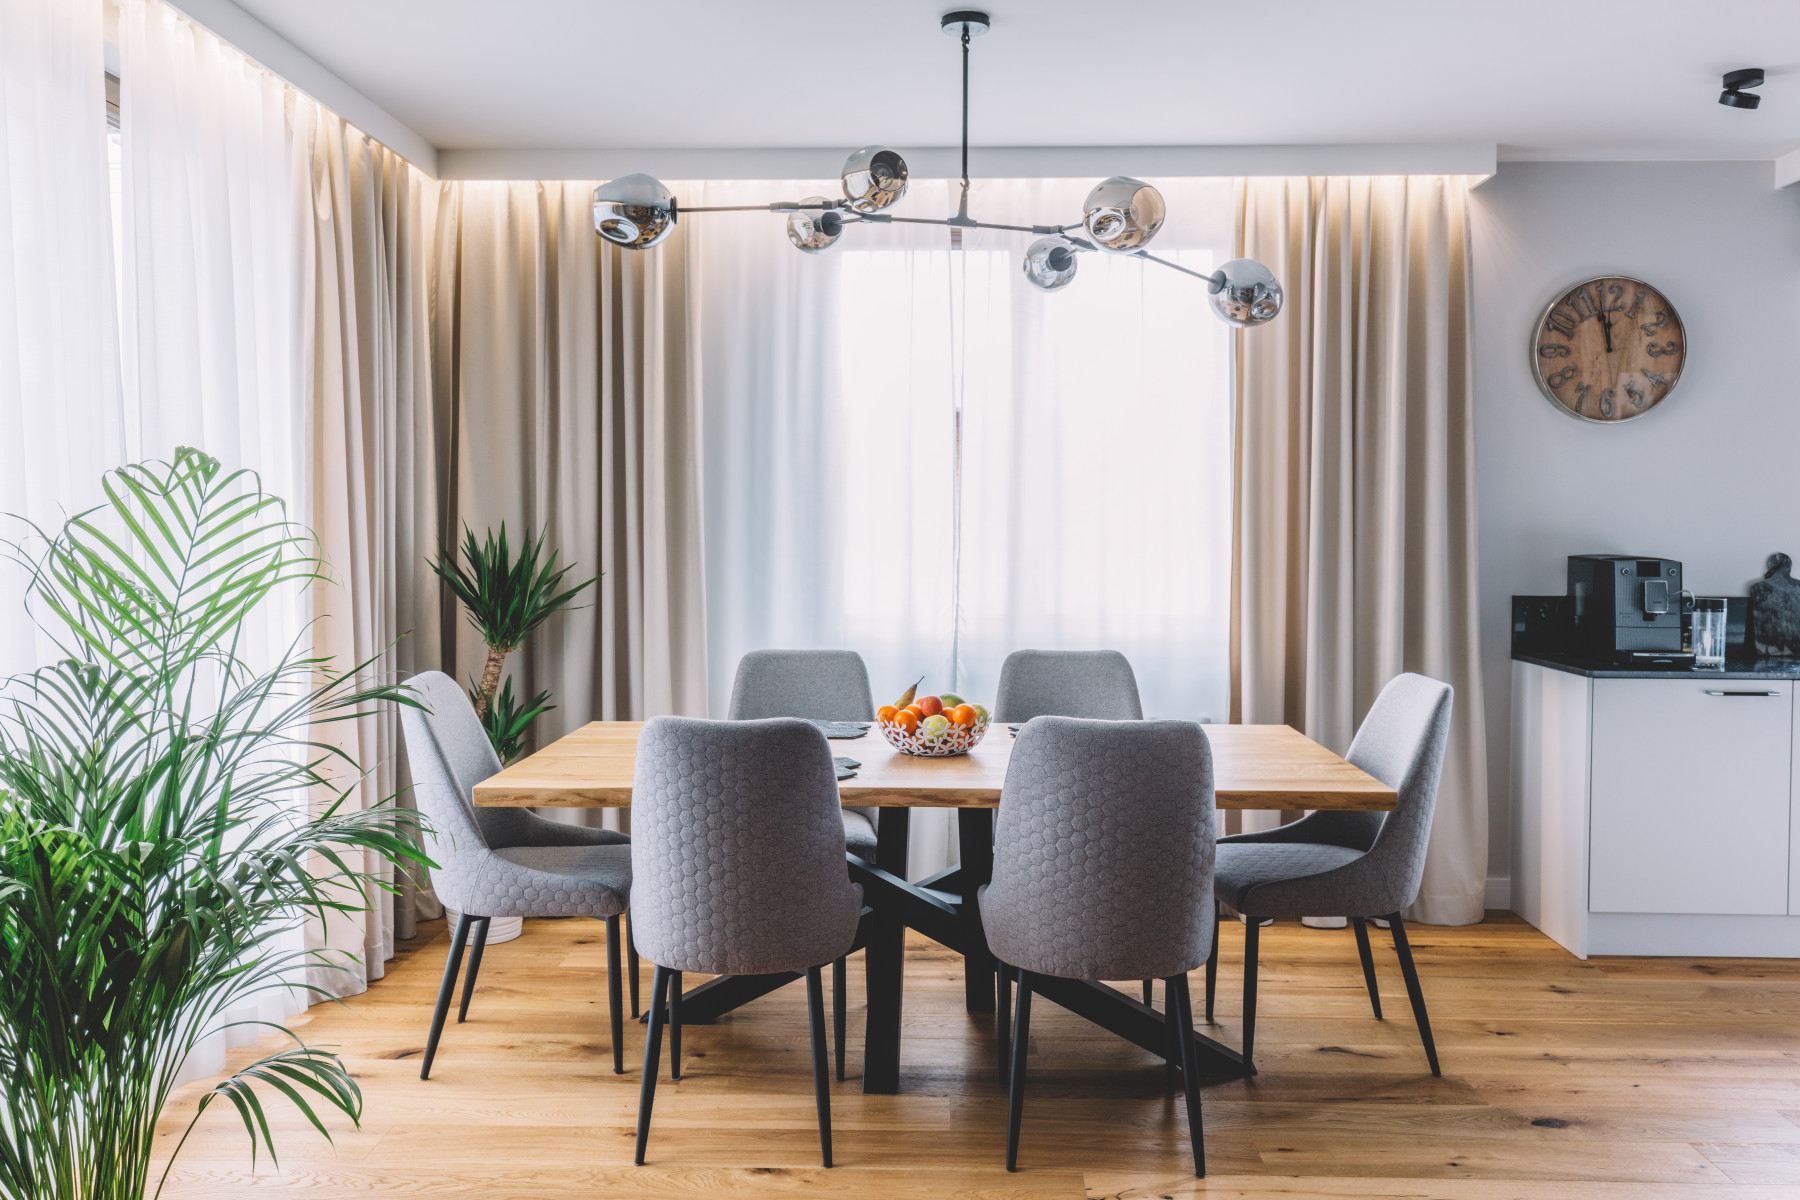 dining room lighting - Tim Kyle